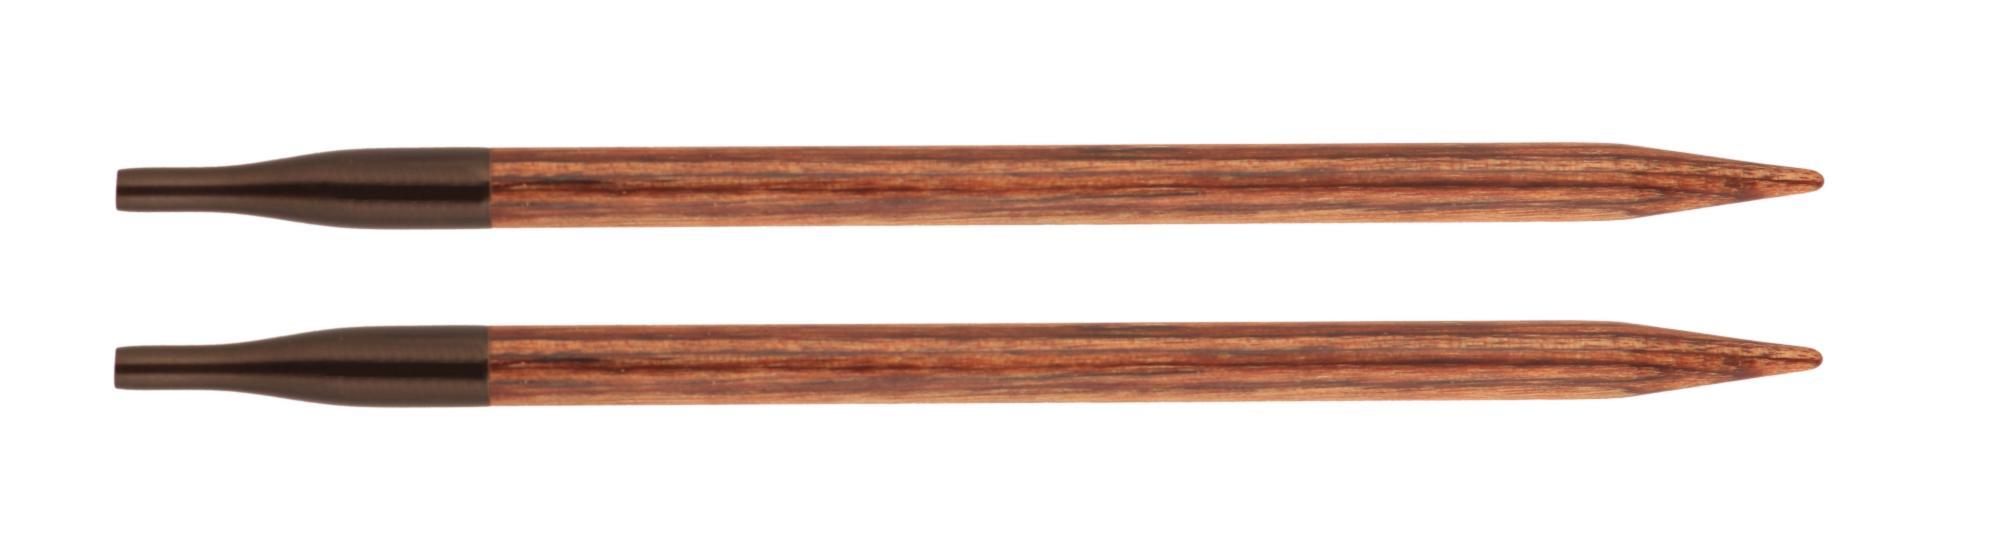 31208 Спицы съемные 5.50 мм Ginger KnitPro